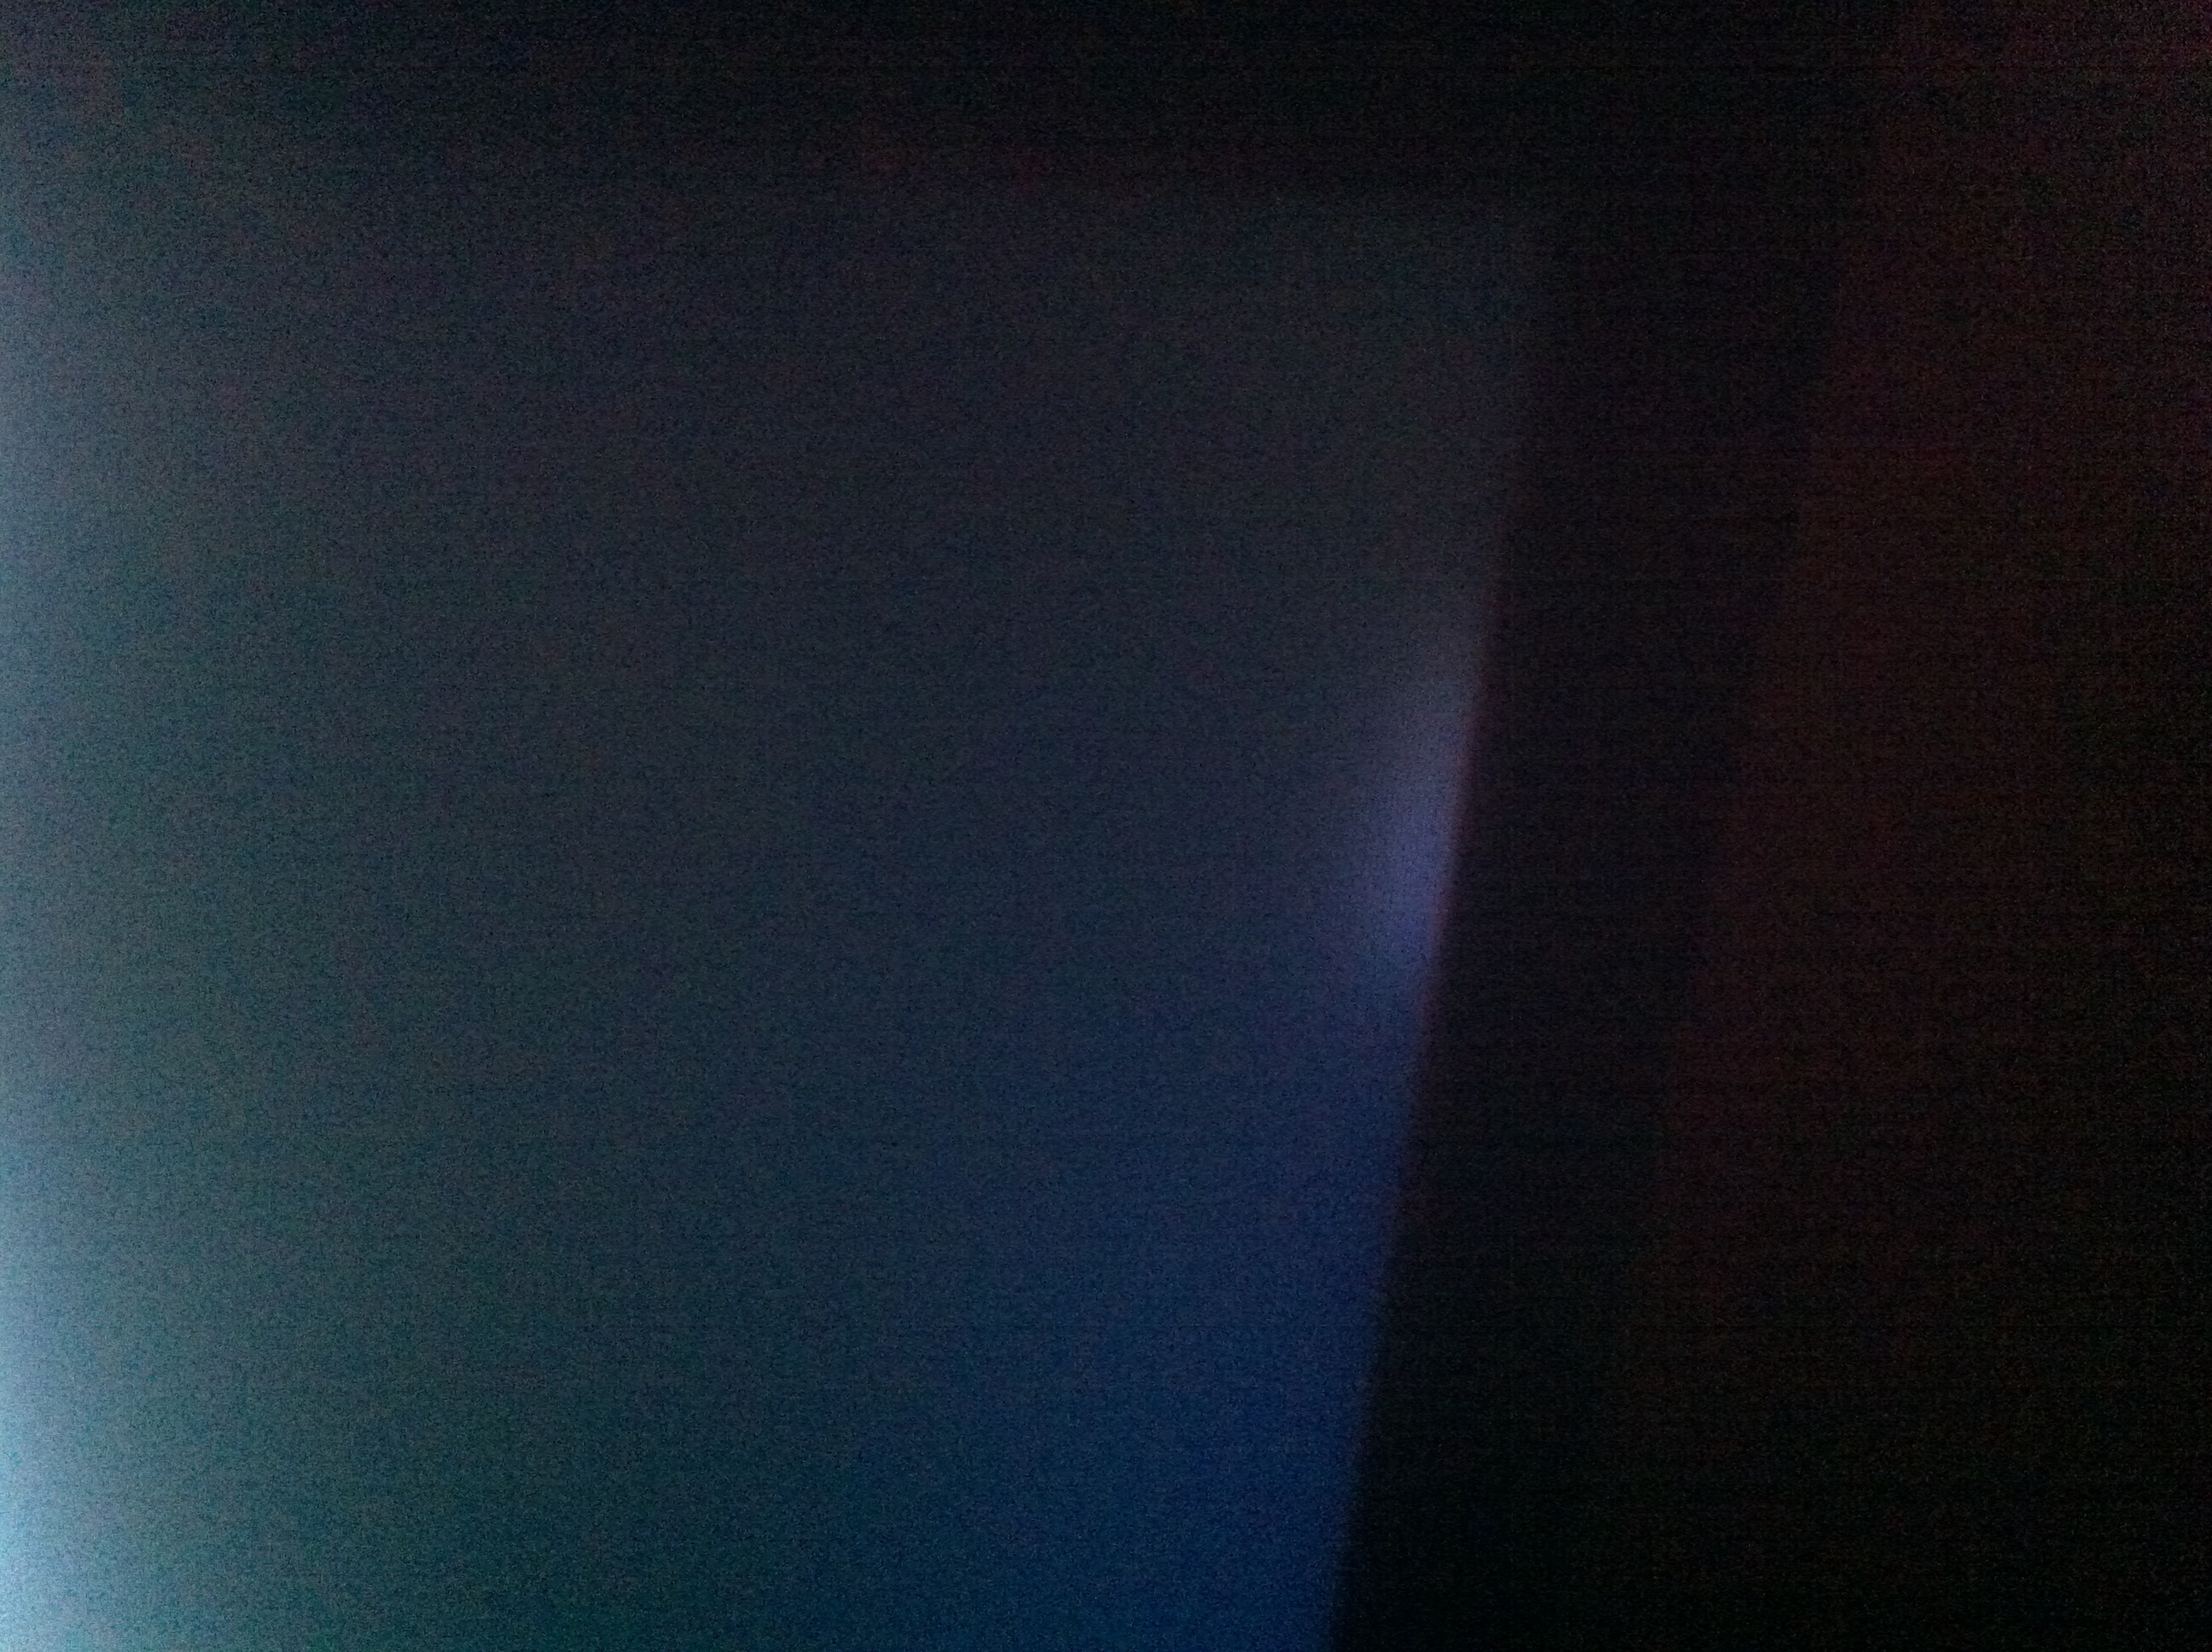 heller fleck auf samsung led tv mit bild was ist kaputt garantie samsung tv. Black Bedroom Furniture Sets. Home Design Ideas